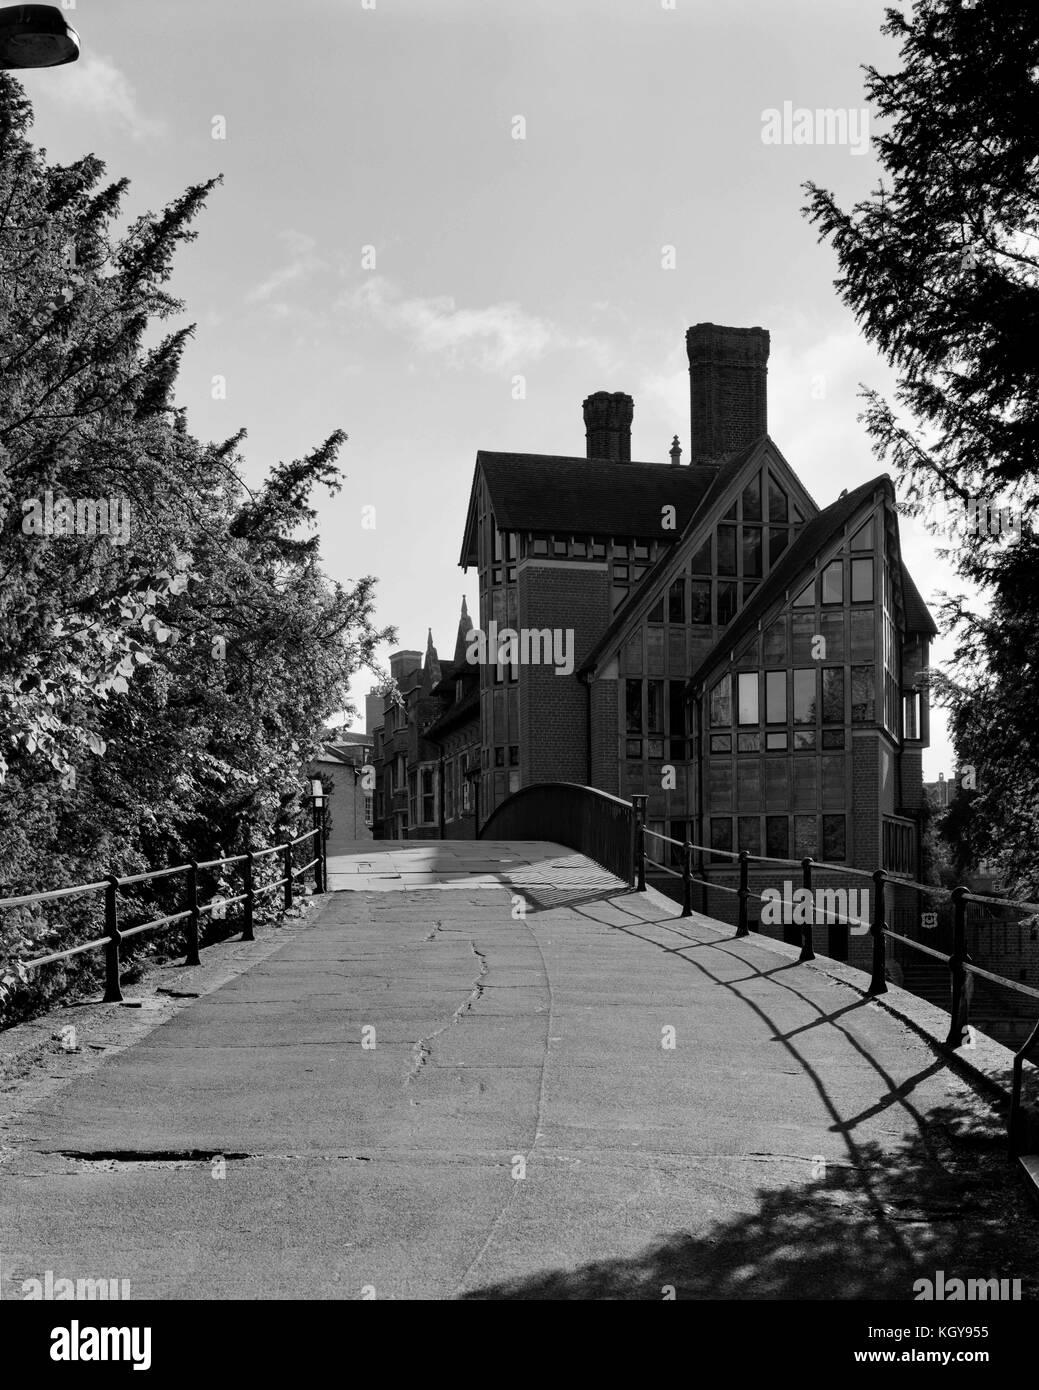 Jerwood Library and Garrett Hostel Bridge Cambridge - Stock Image